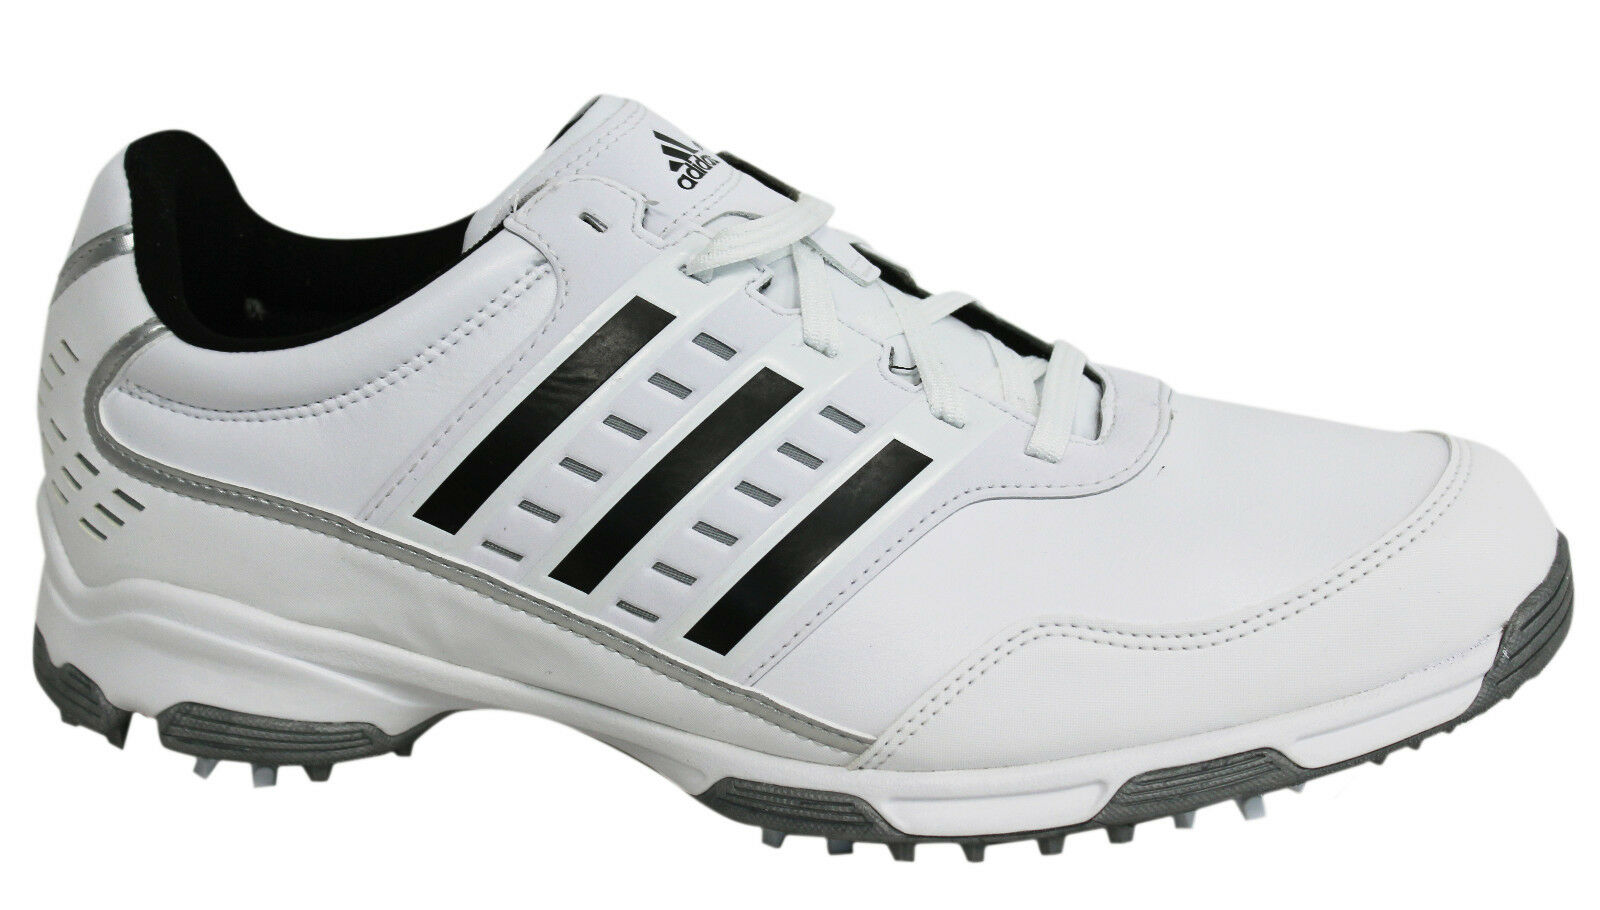 Adidas Mens Golf Lite Traxion ClimaProof Lace Up Mens Golf Trainers Q46874 U16